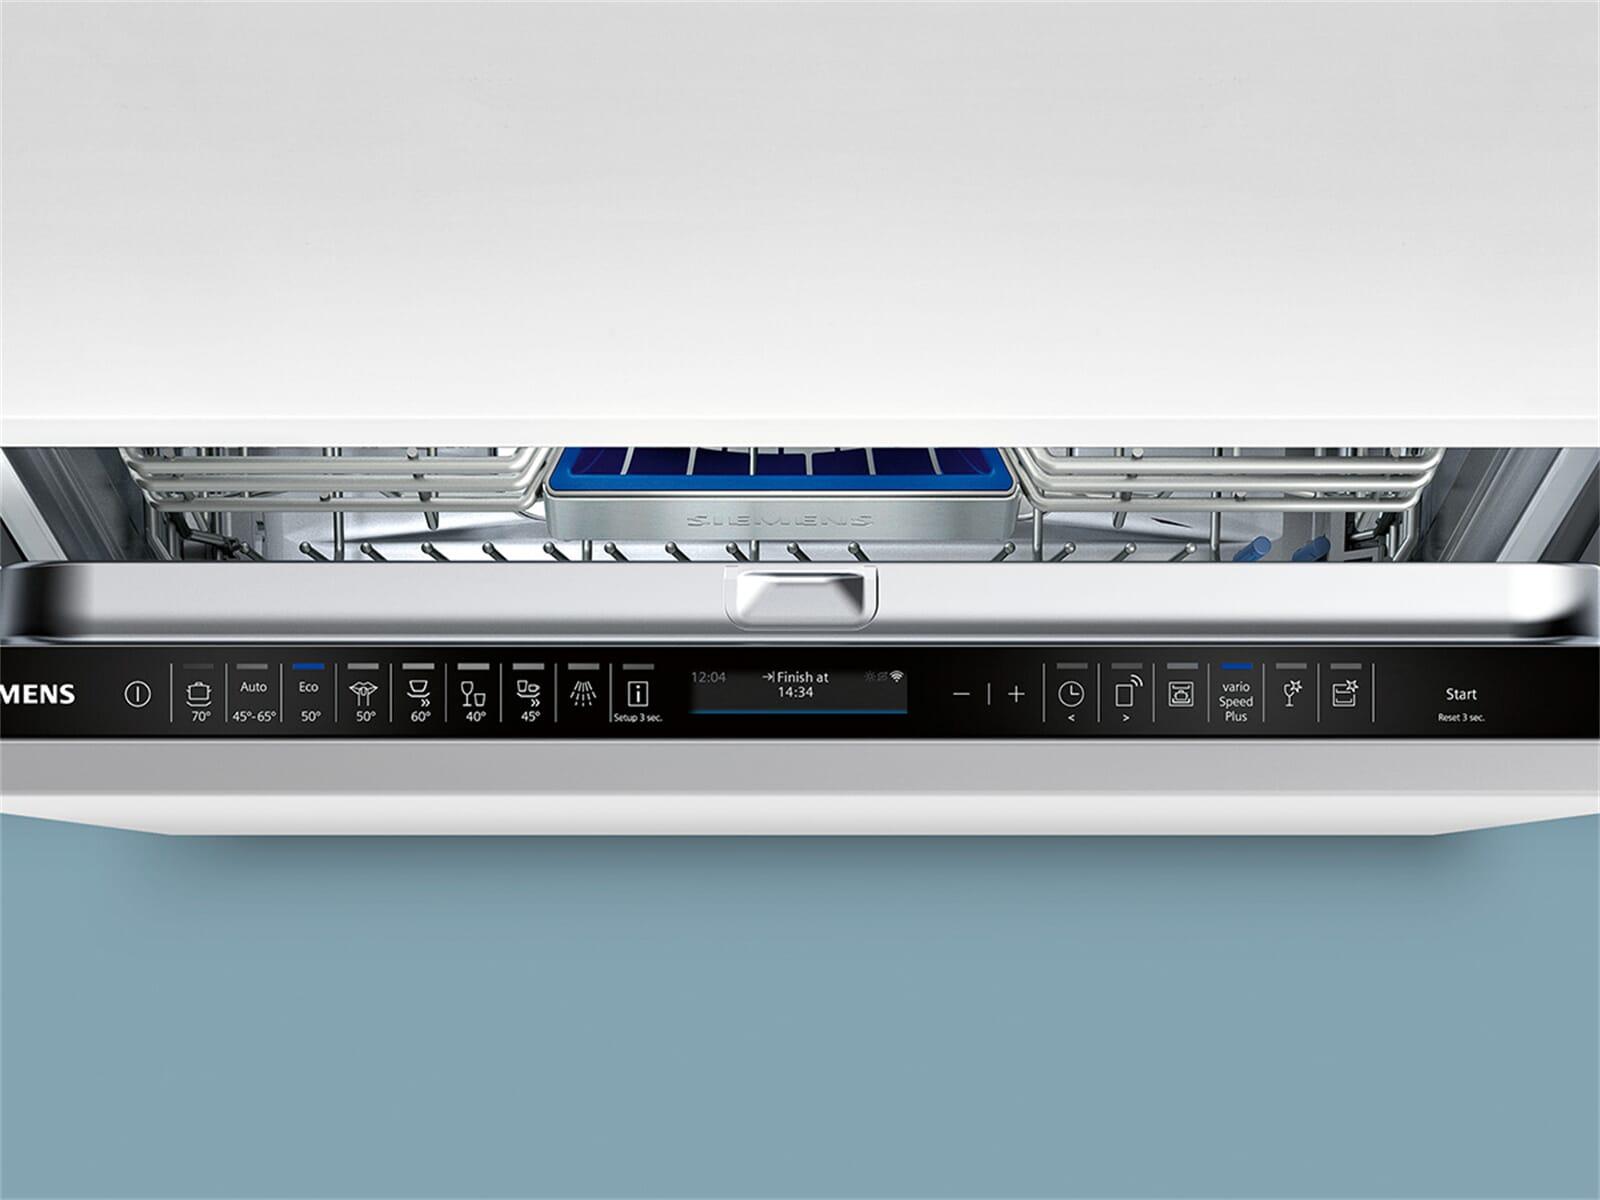 Siemens SX758X06TE Vollintegrierbarer Einbaugeschirrspüler XXL